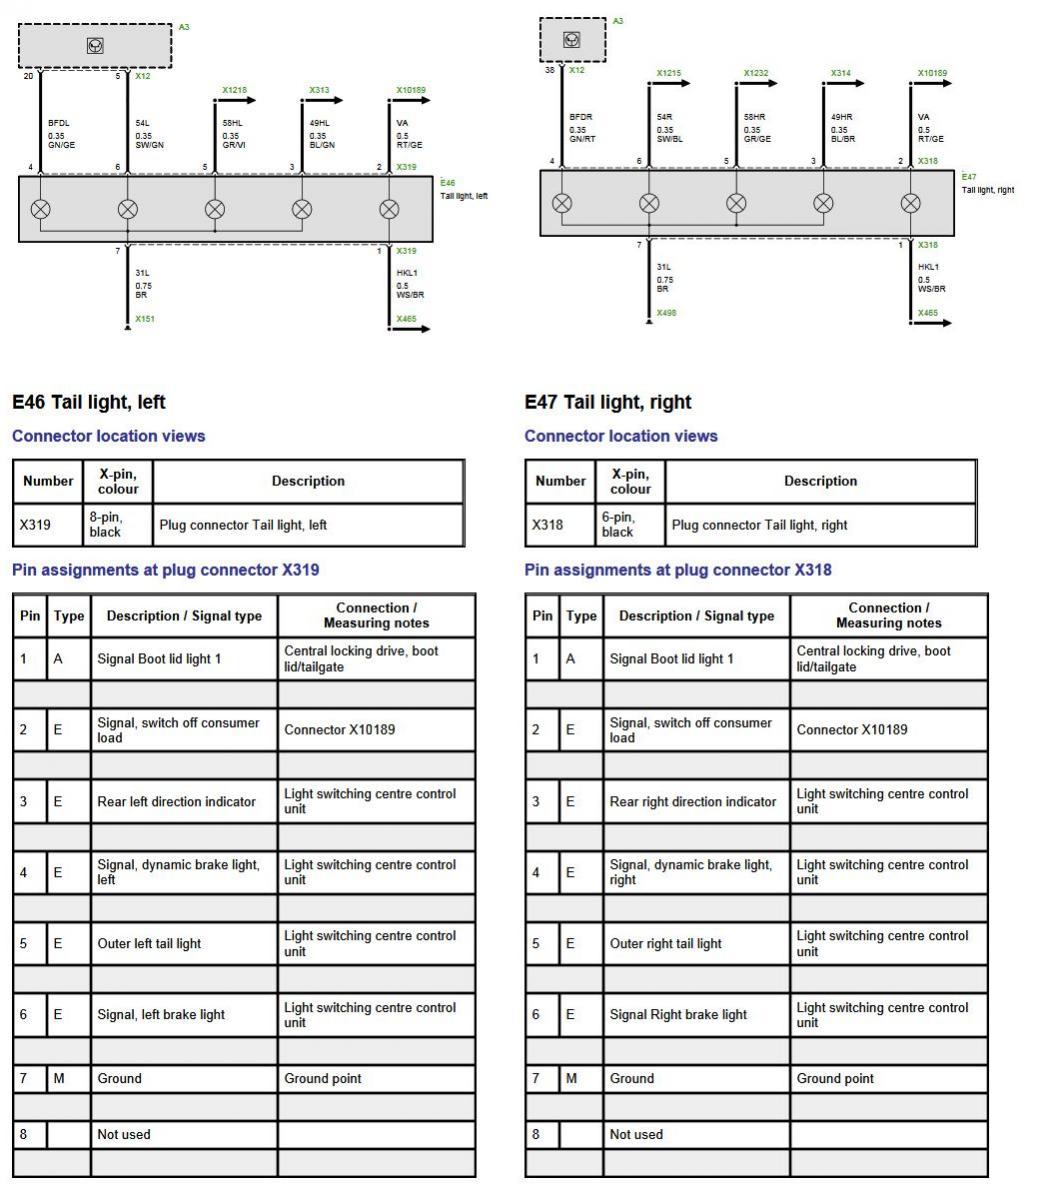 e tail light wiring diagram e image wiring diagram bmw e90 wiring diagram tail lights wiring diagram on e90 tail light wiring diagram